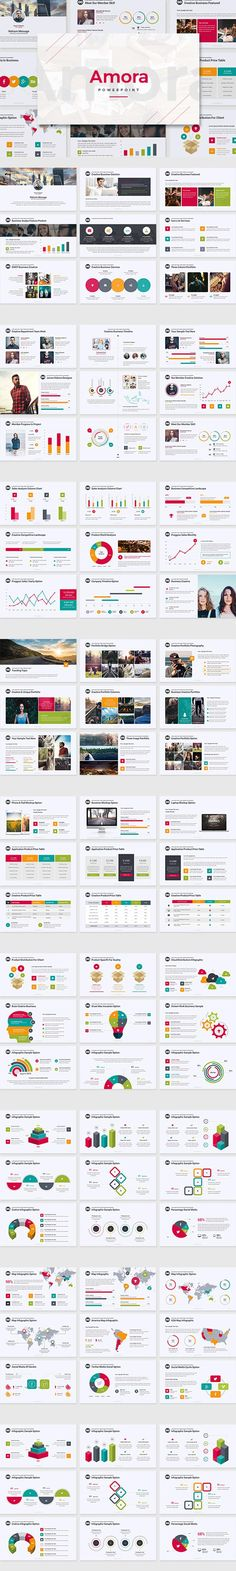 #presentation #template from zigens | DOWNLOAD: https://creativemarket.com/zigens/708486-Amora-Powerpoint-Template?u=zsoltczigler